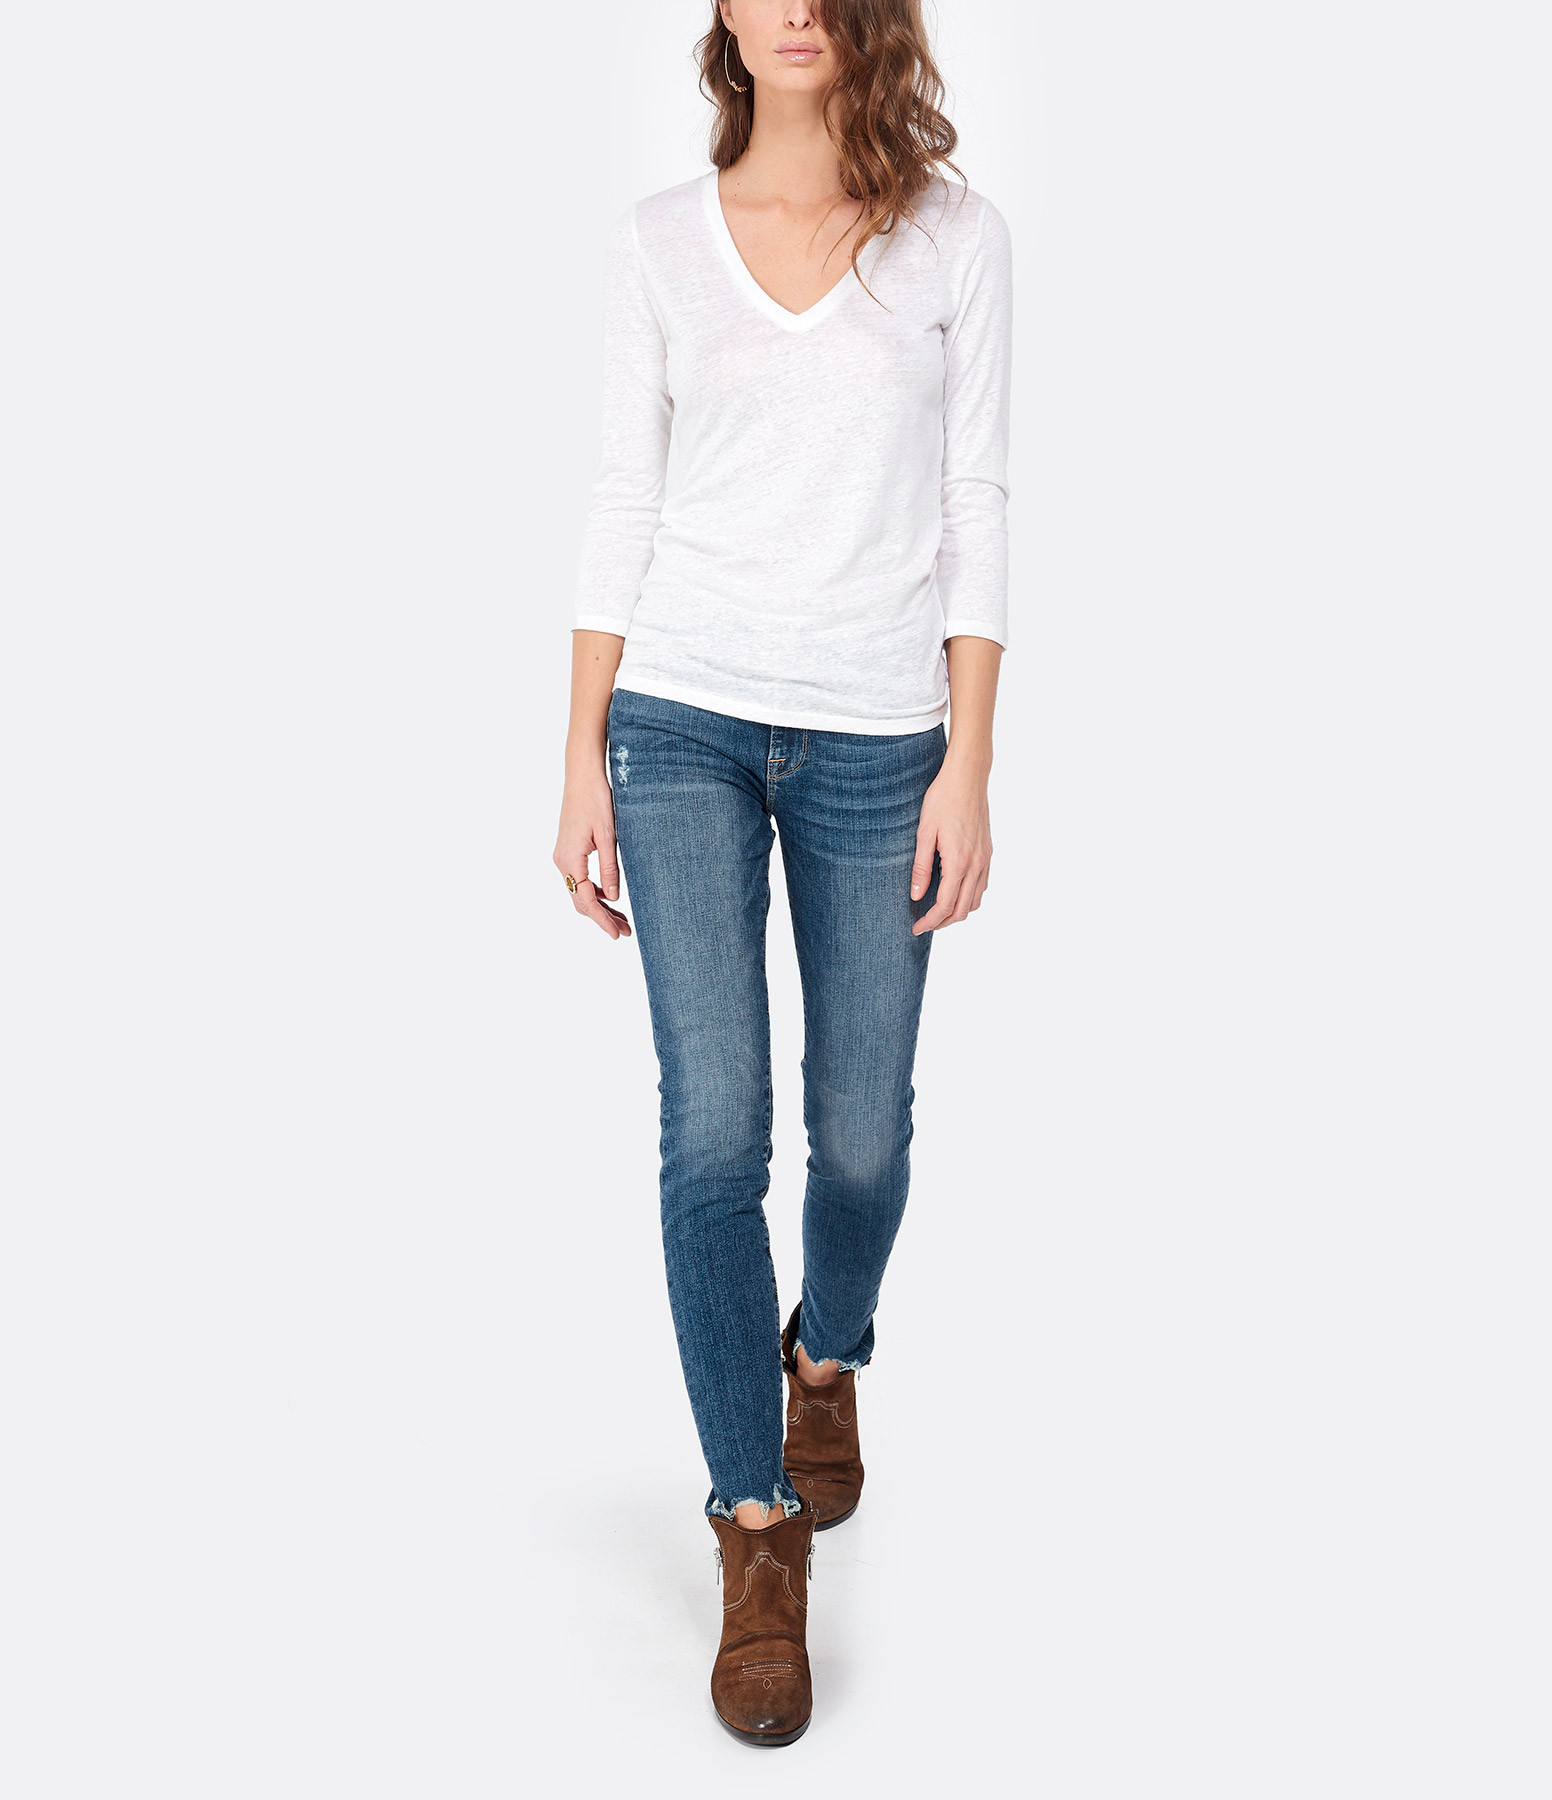 MAJESTIC FILATURES - Tee-shirt Col V 3/4 Lin Blanc